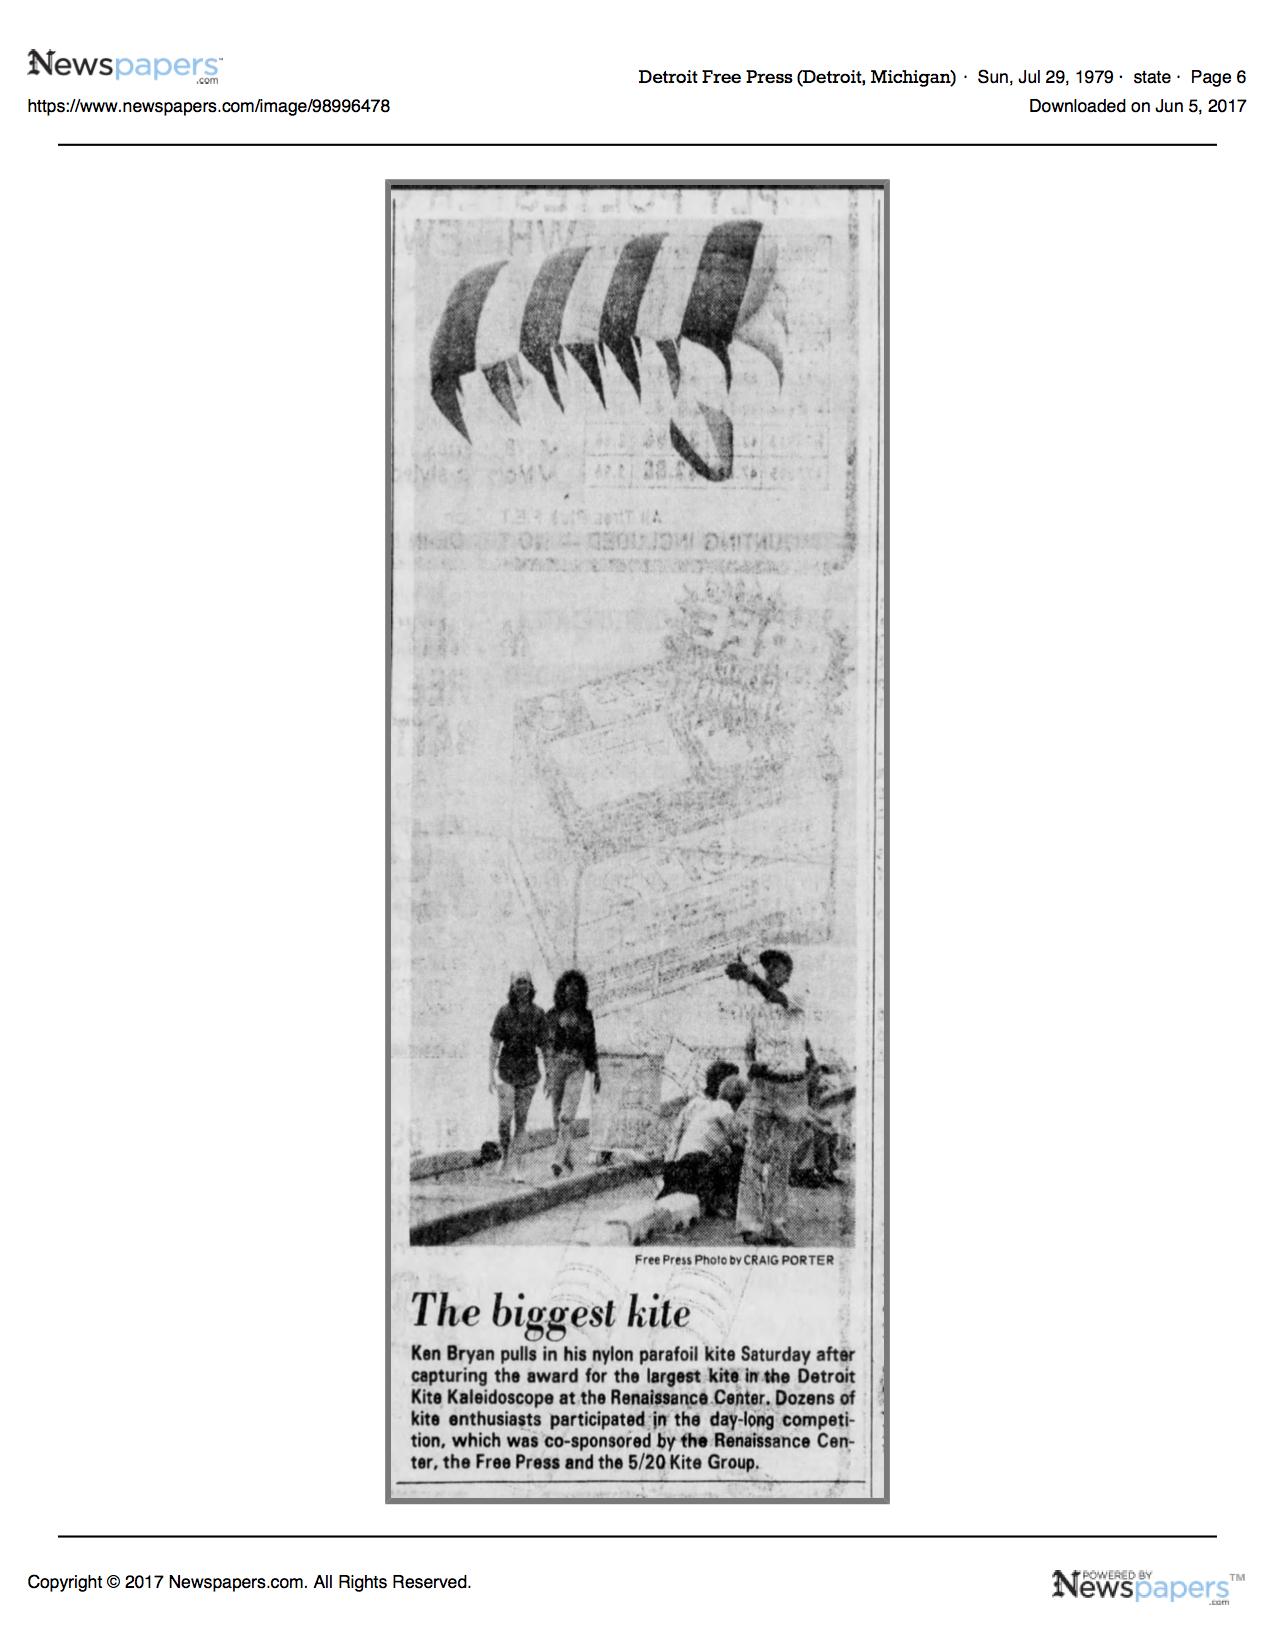 Detroit_Free_Press_Sun__Jul_29__1979_.jpg